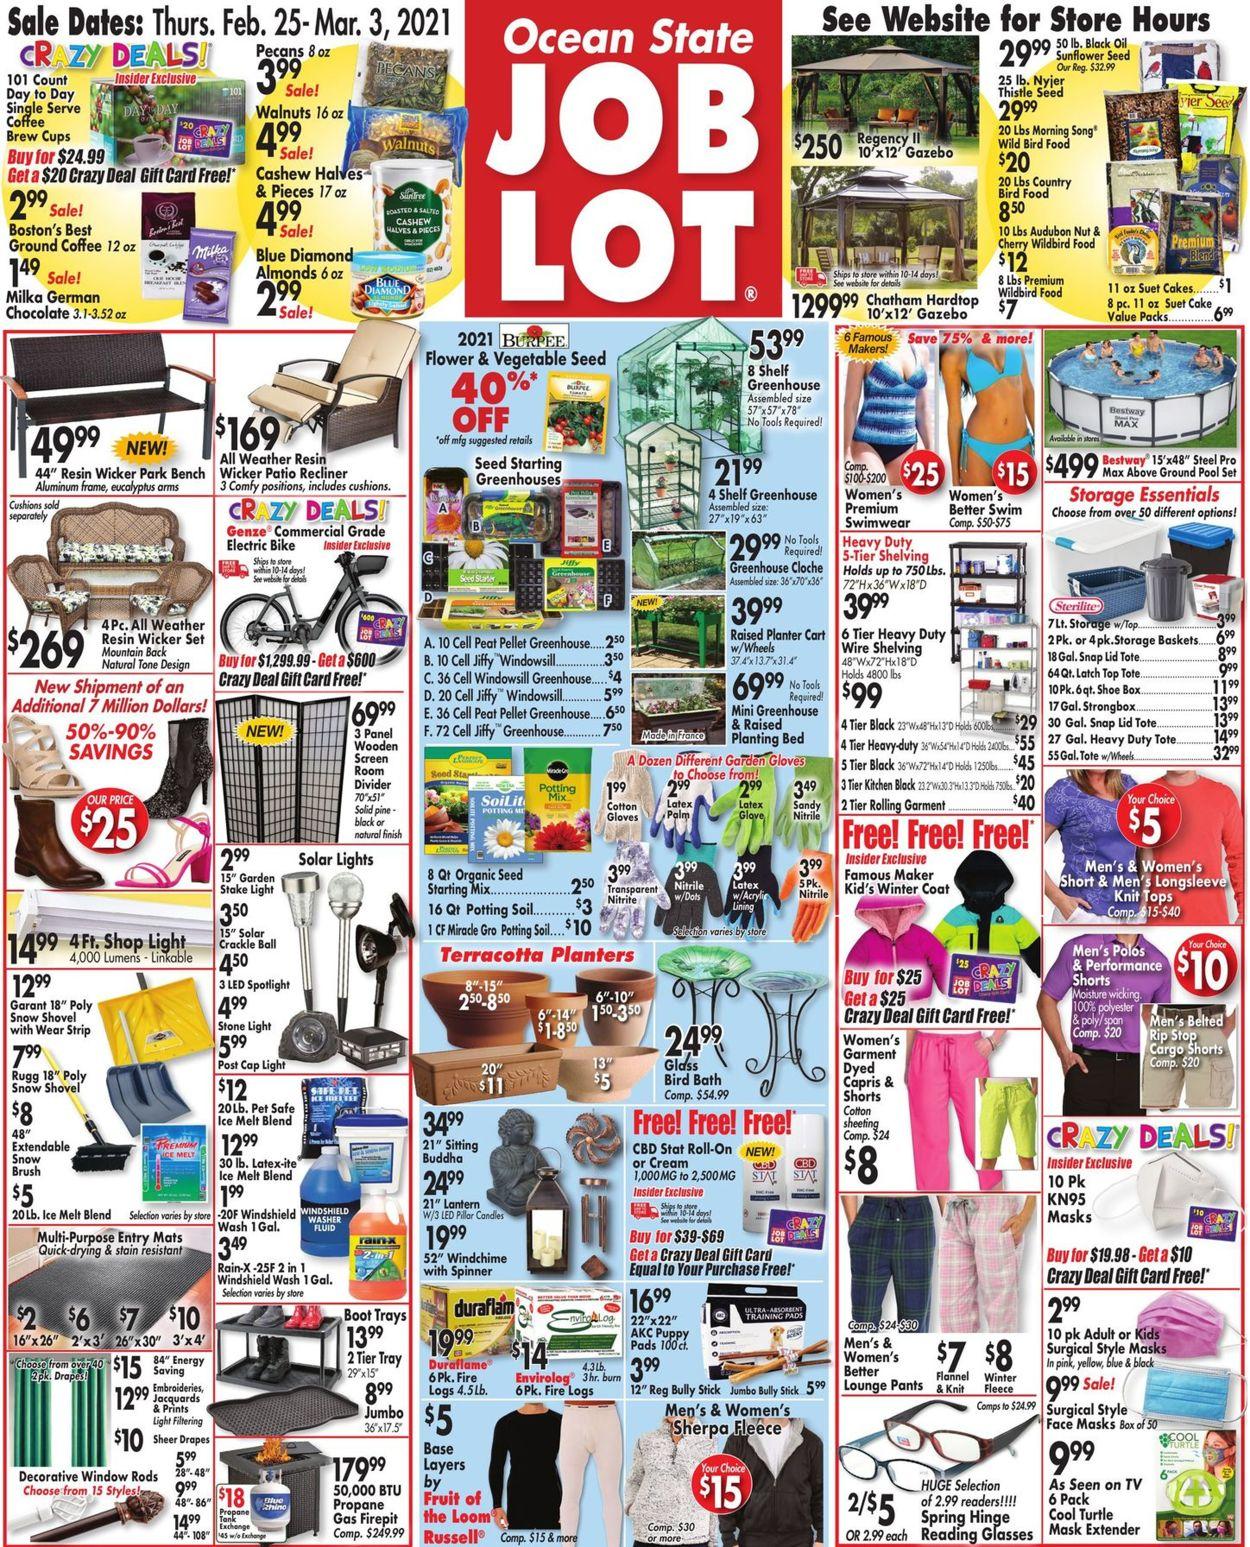 Ocean State Job Lot Weekly Ad Circular - valid 02/25-03/03/2021